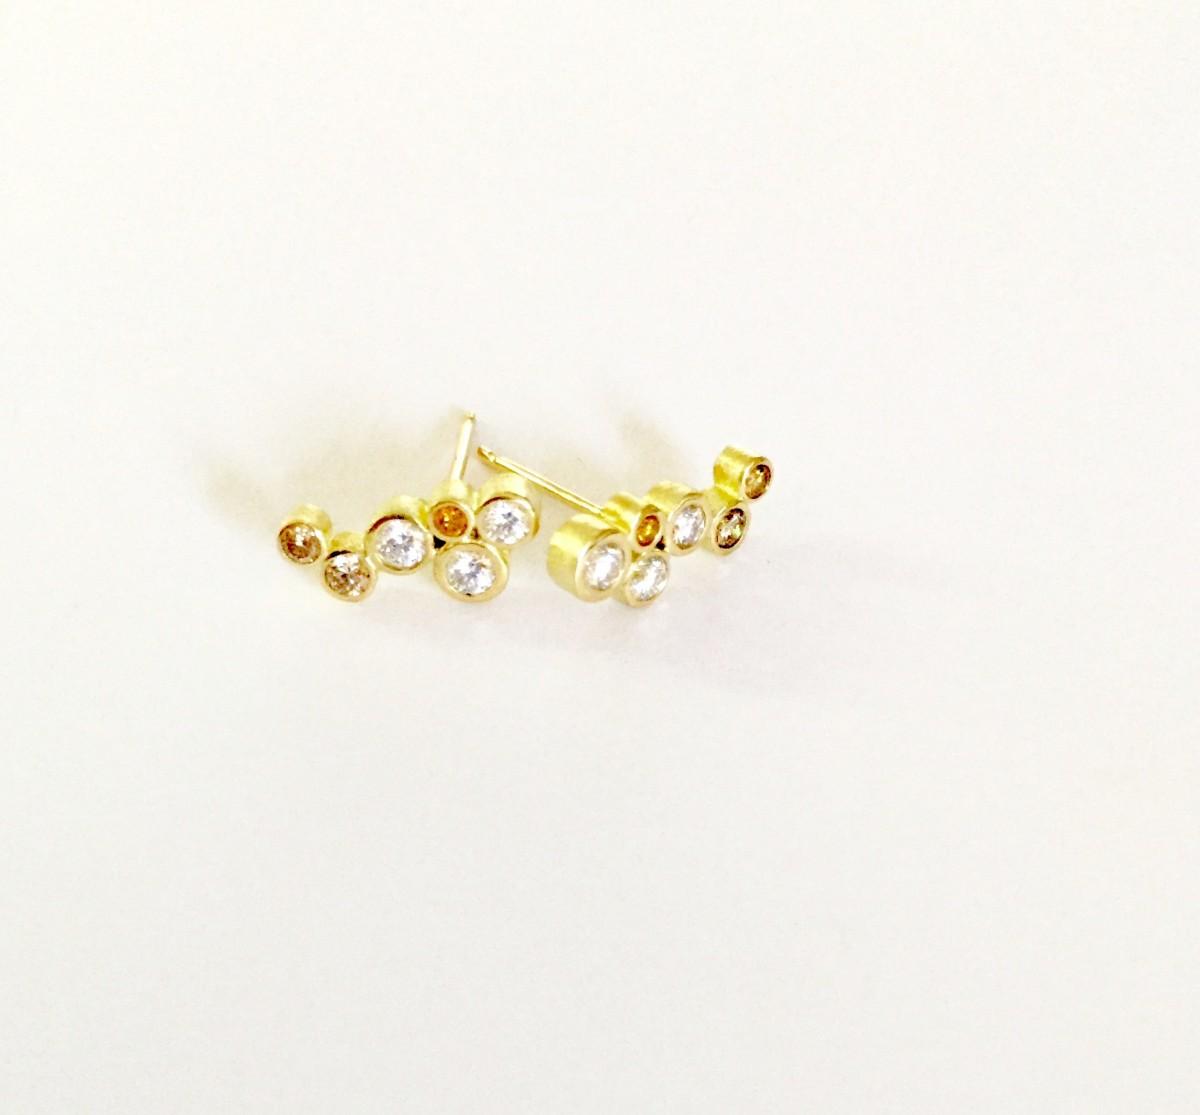 Natural Fancy Multi-Color Diamond Earrings